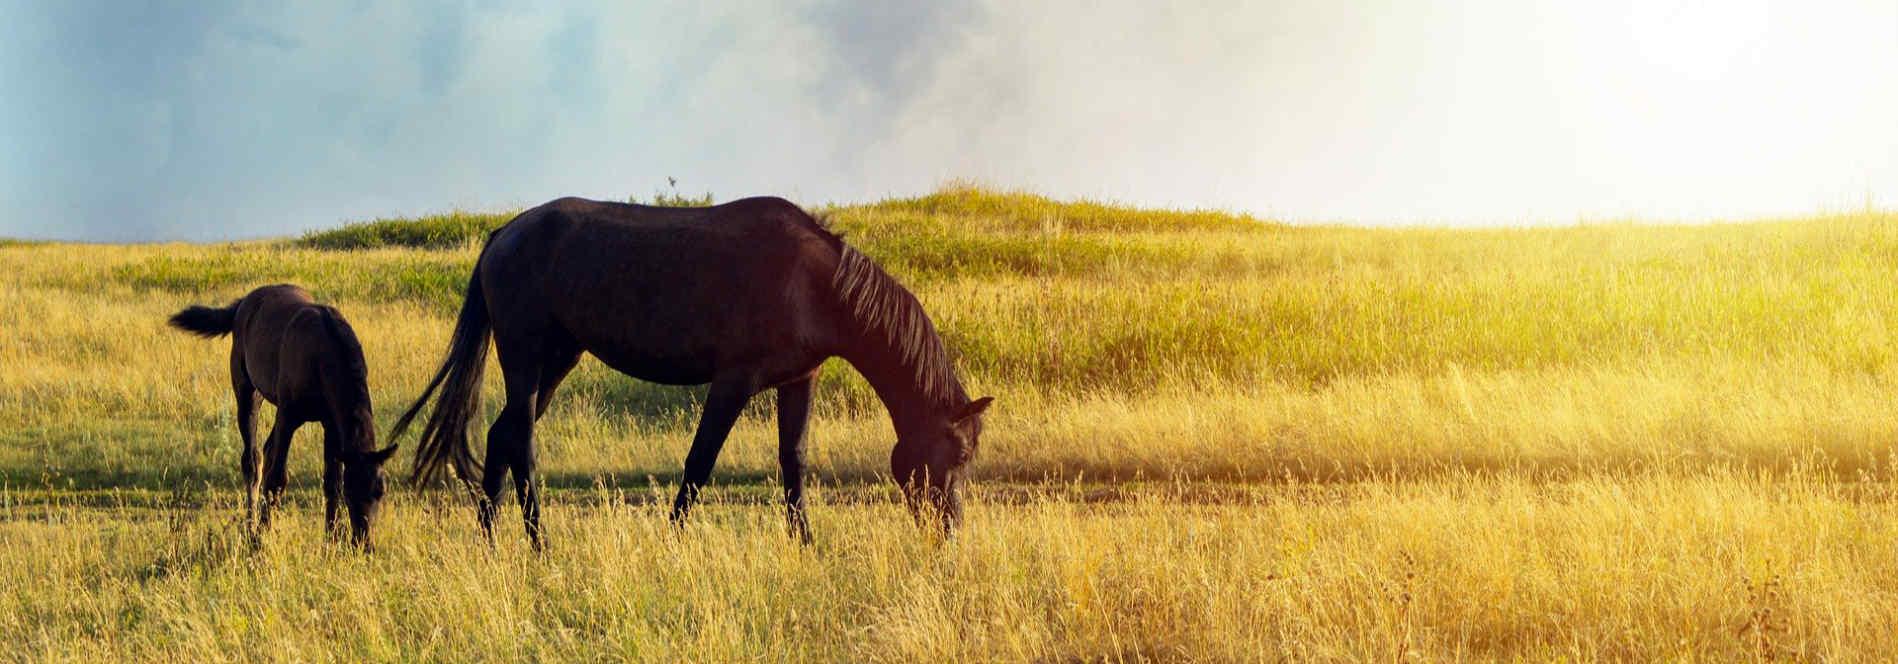 horse-colt-grazing-1.jpg